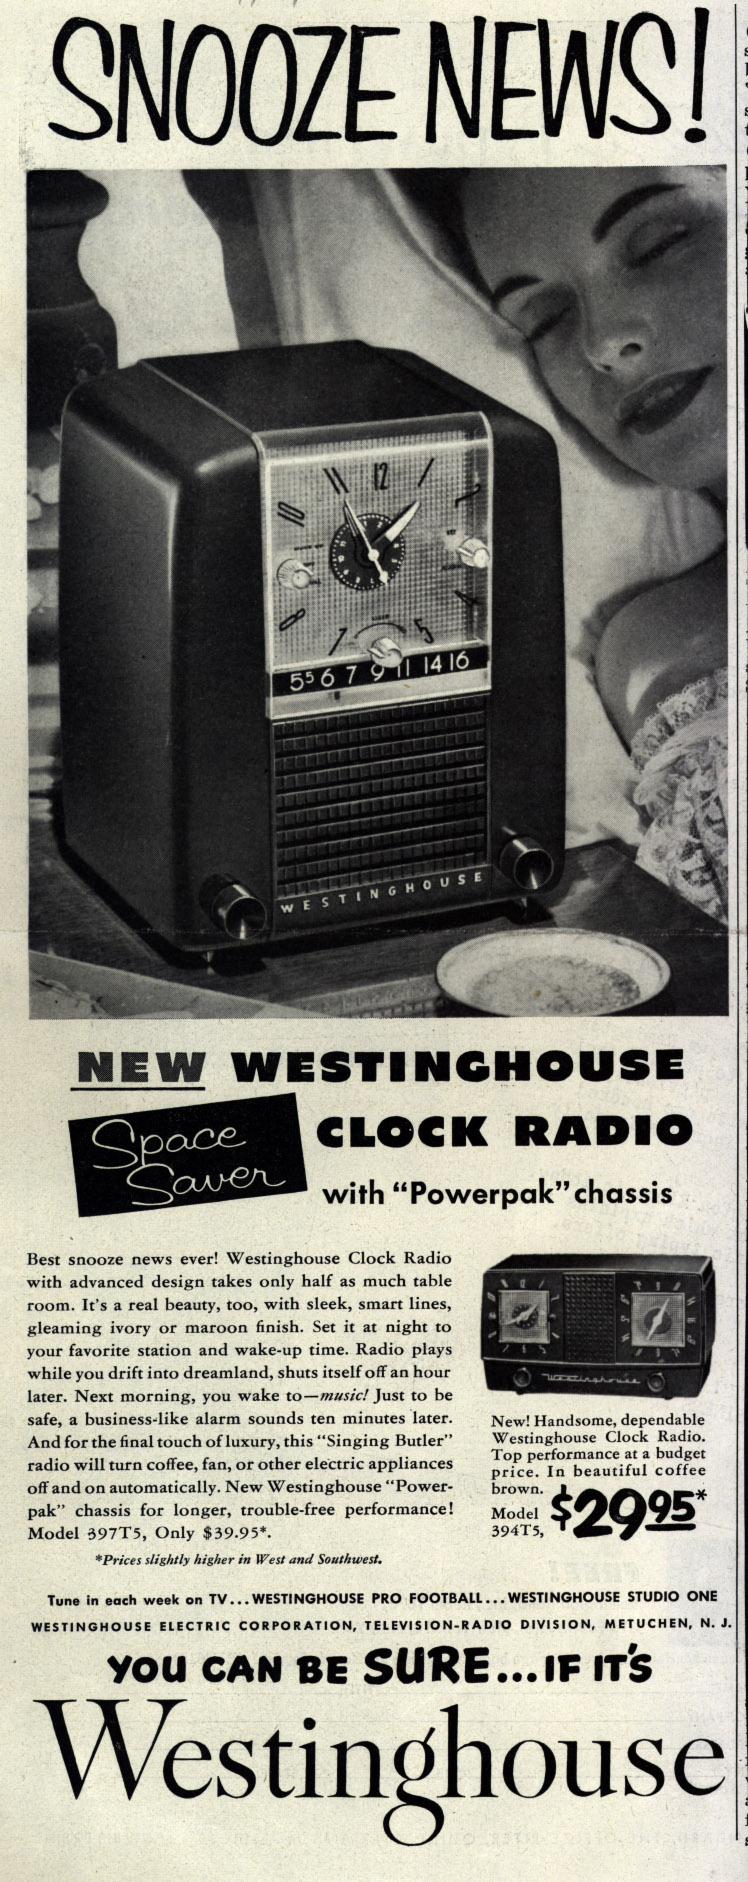 Snooze_News_New_Westinghouse_Clock_Radio